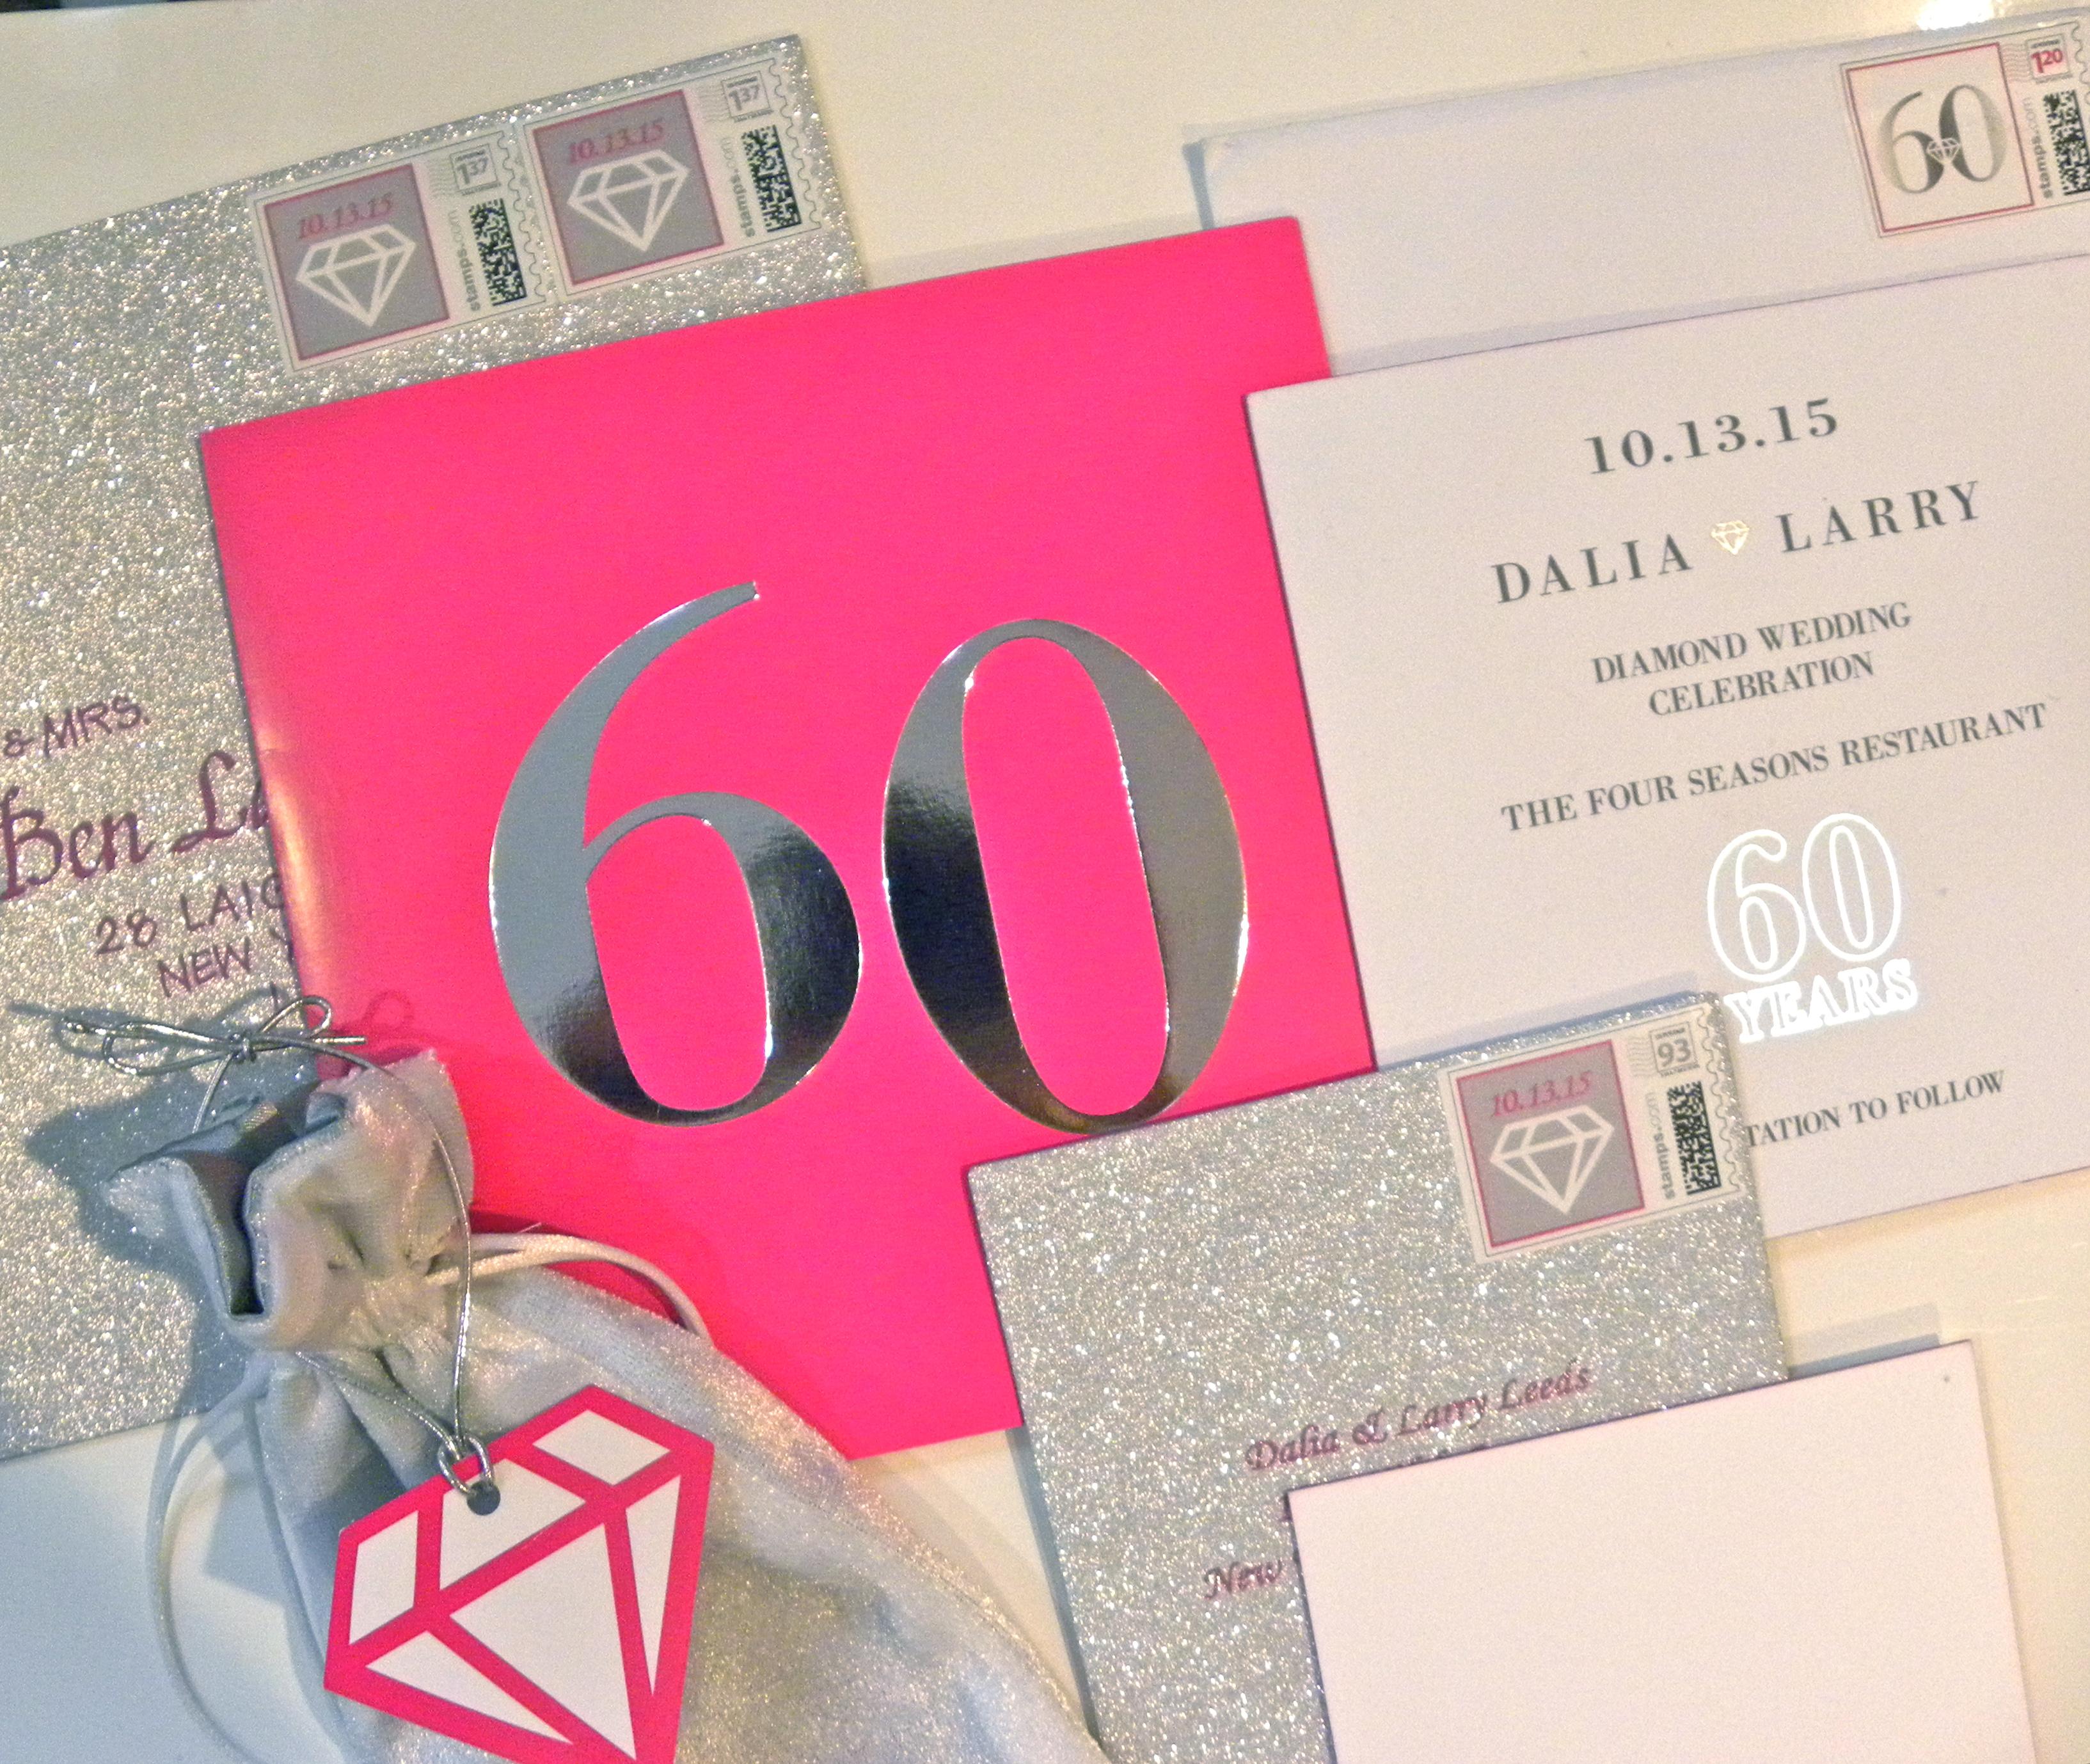 60th Wedding Anniversary Invitation Suite